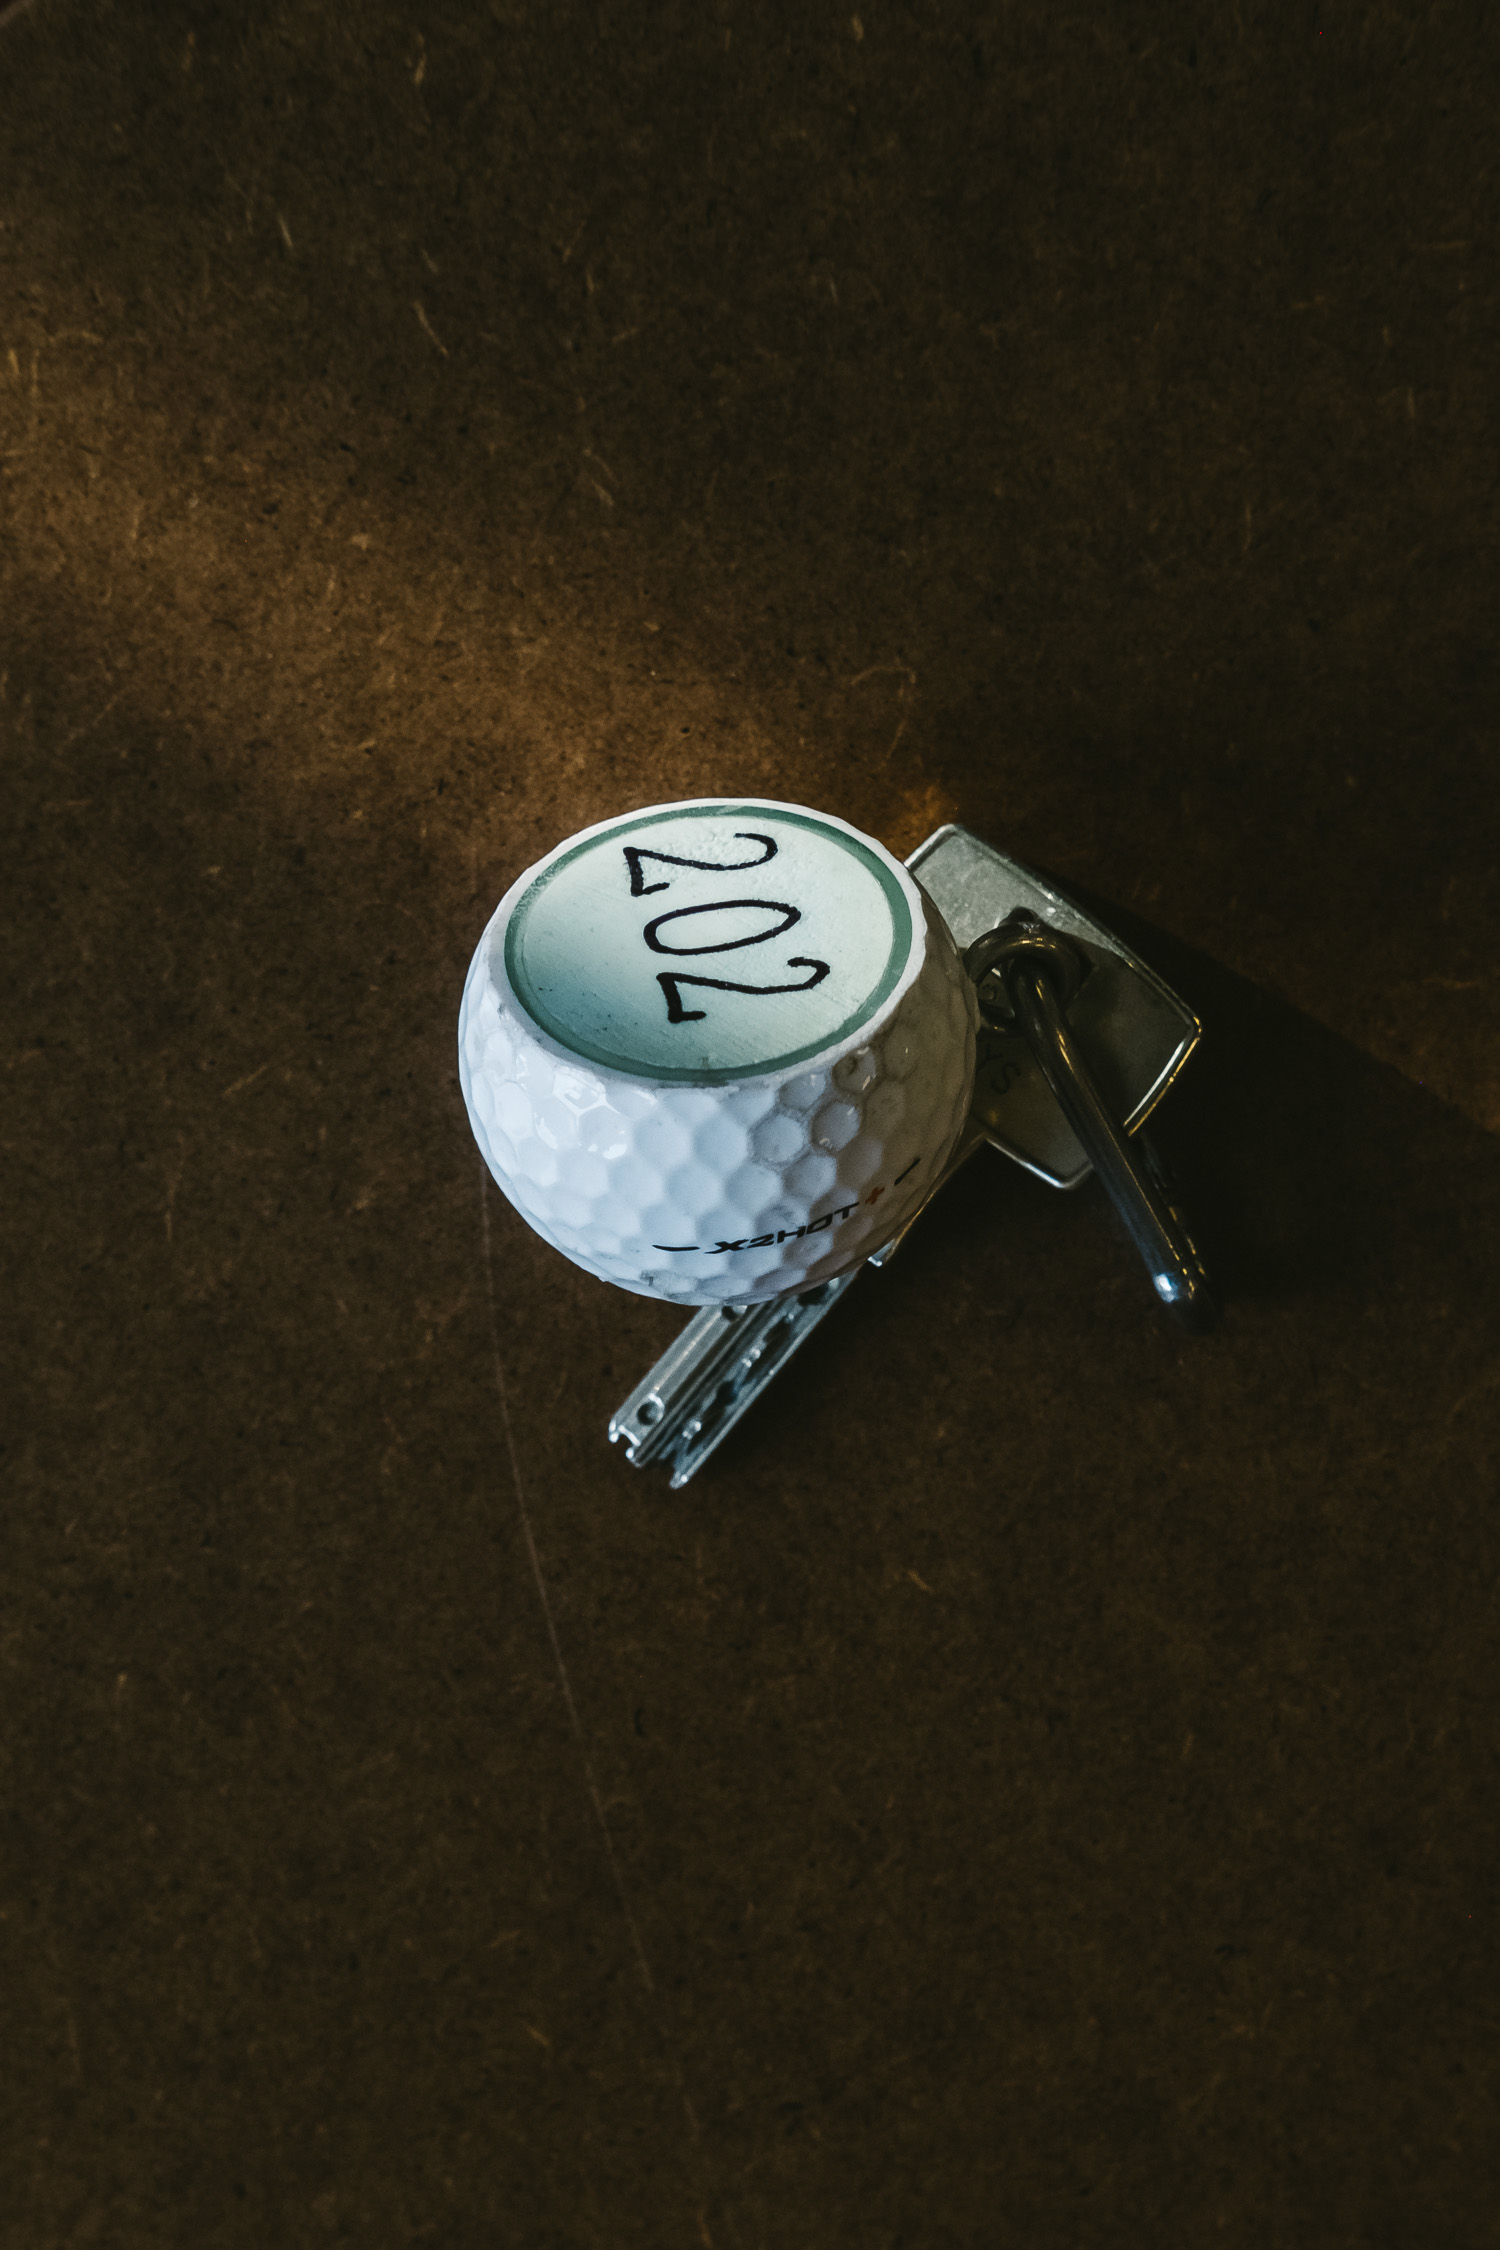 magdas Hotel in Vienna, Austria. Room key with attachment (sliced golf ball)